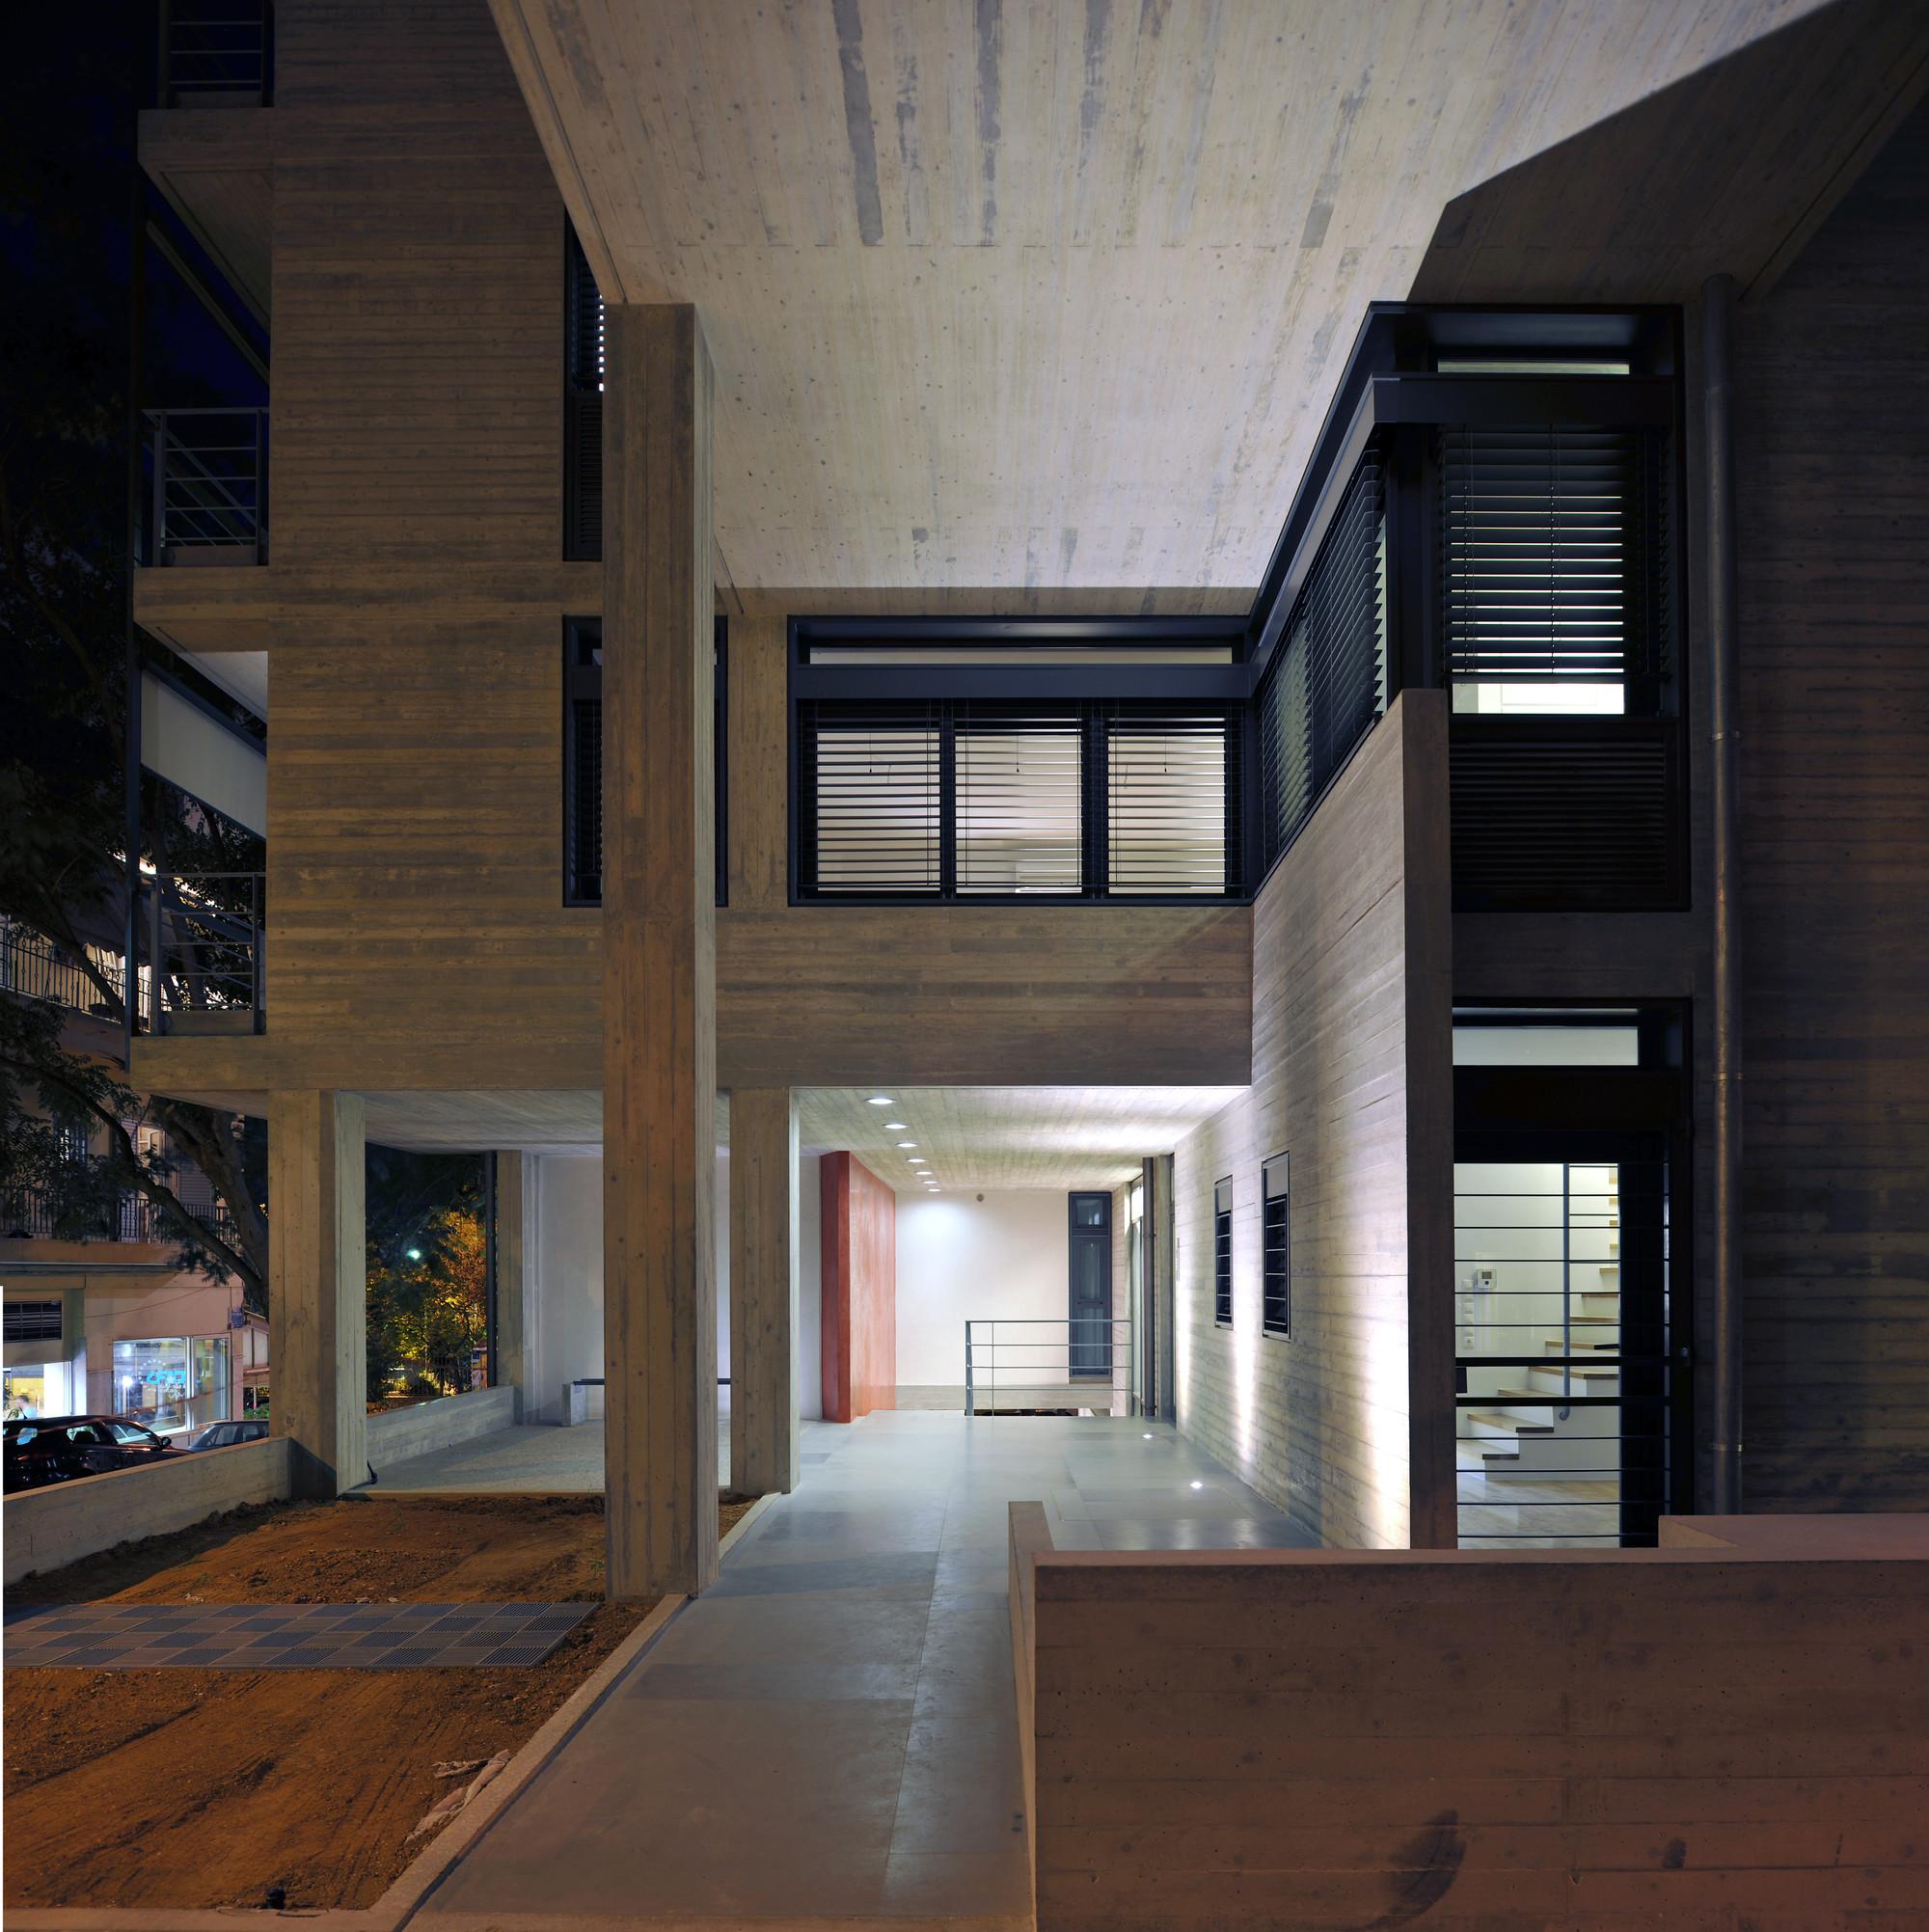 Edificio de apartamentos en la calle Deinokratous, Atenas / Giorgos Aggelis, © H. Louizidis